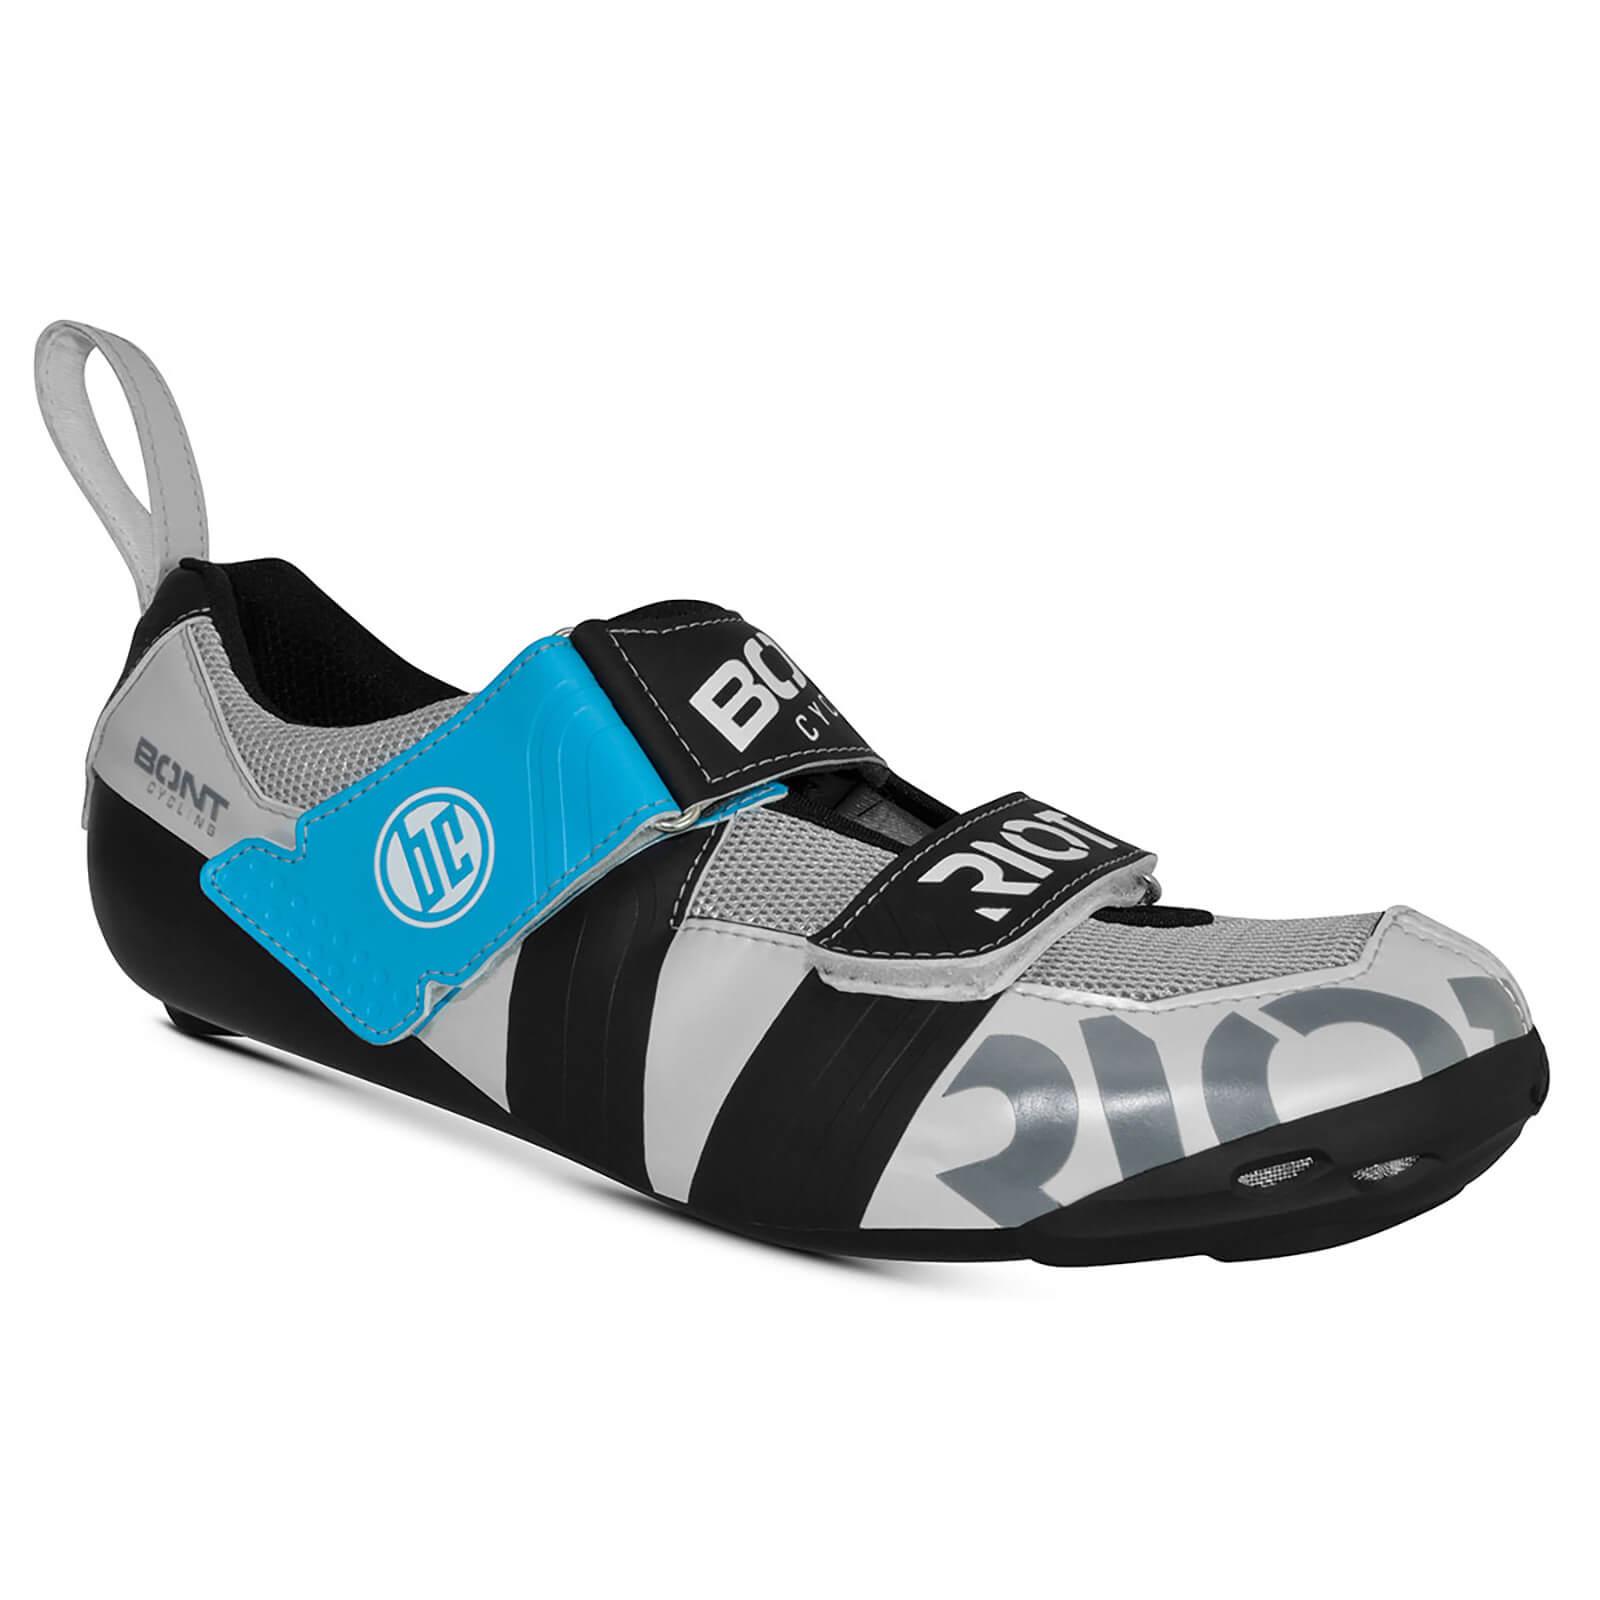 Bont Riot TR+ Road Shoes - EU 41 - White/Black